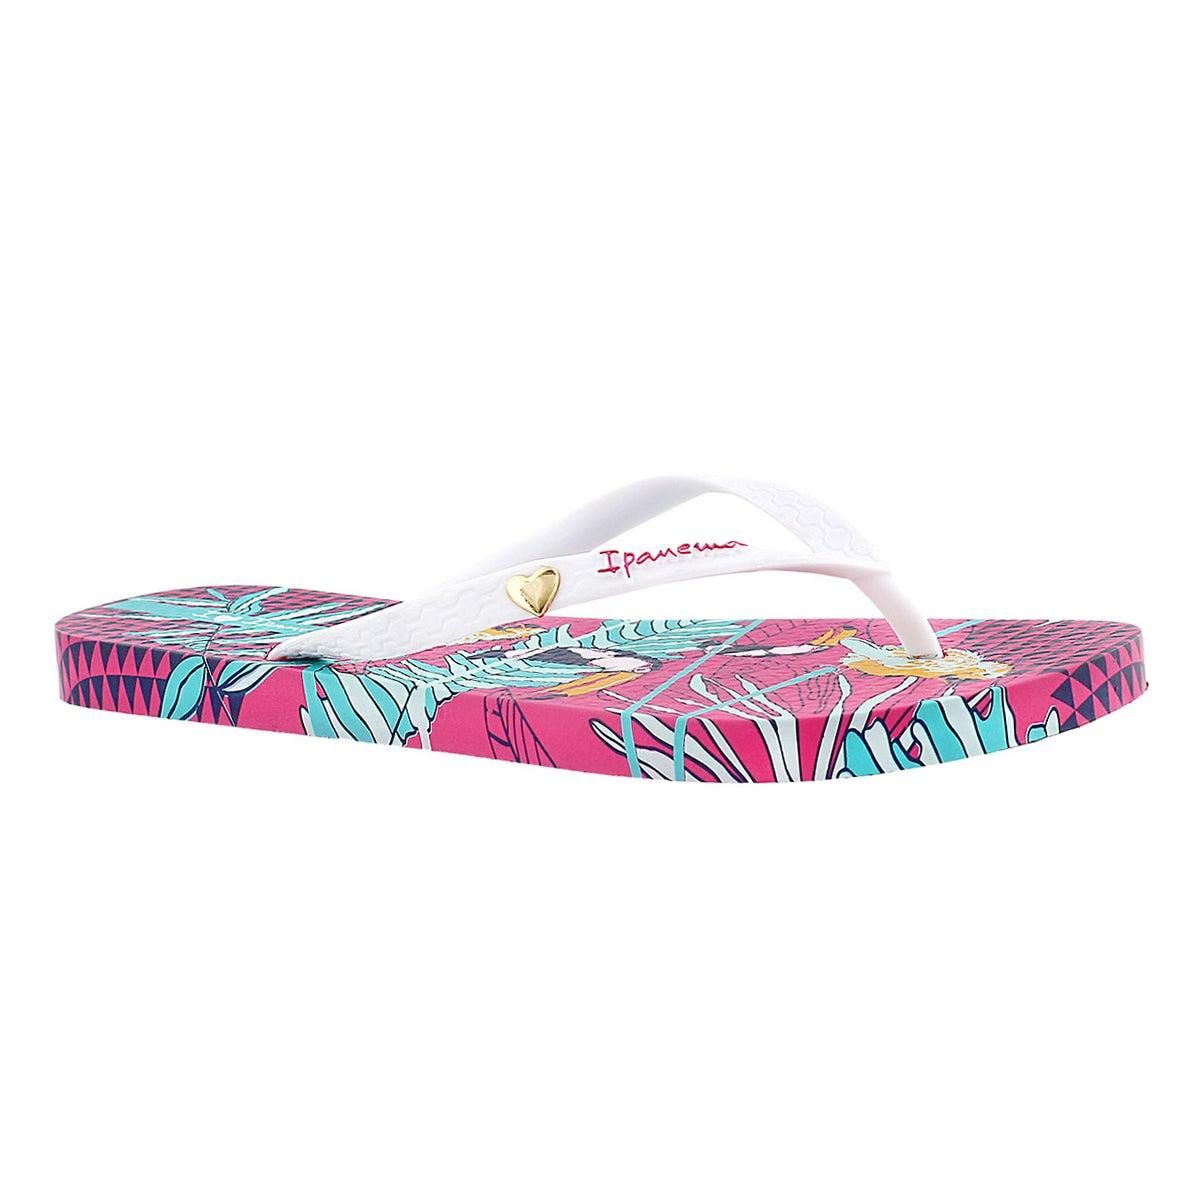 Women's PARAISO pink/white printed flip flops